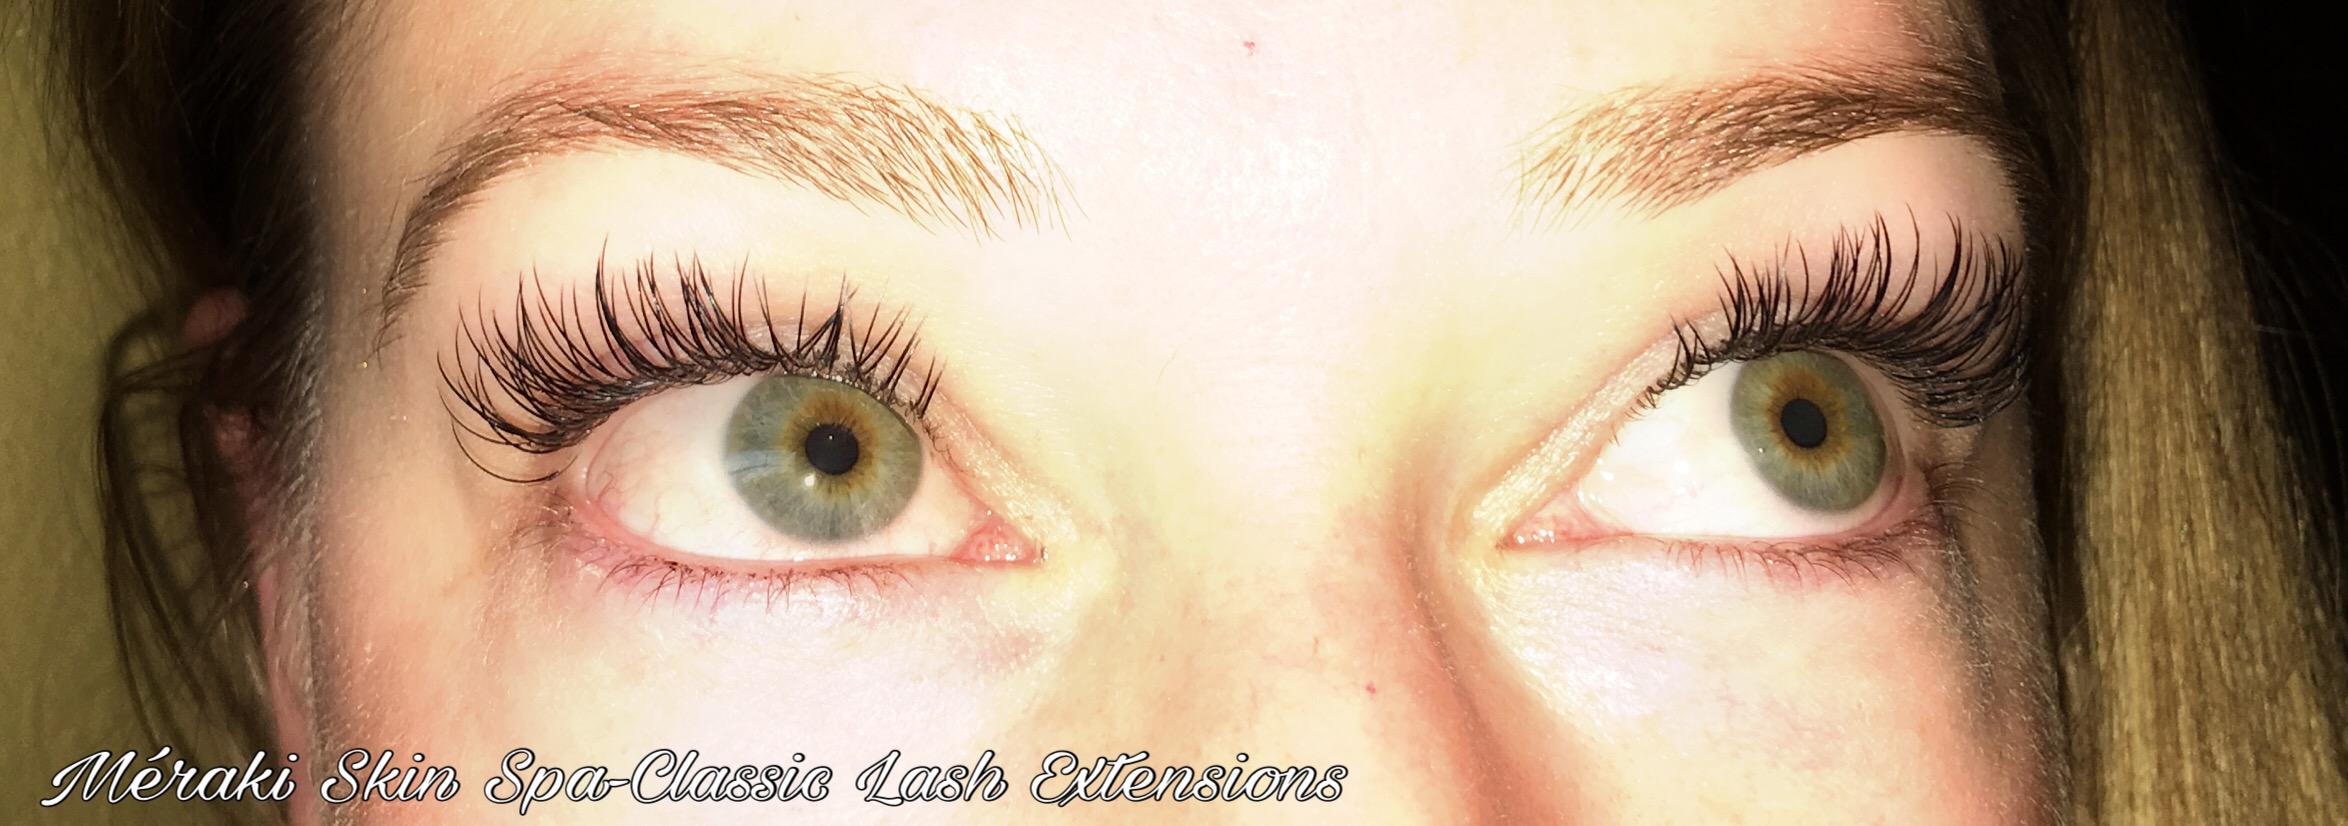 meridian Idaho classic eyelash extensions C CURL-ROAYL-CLASSIC ALT TEXT